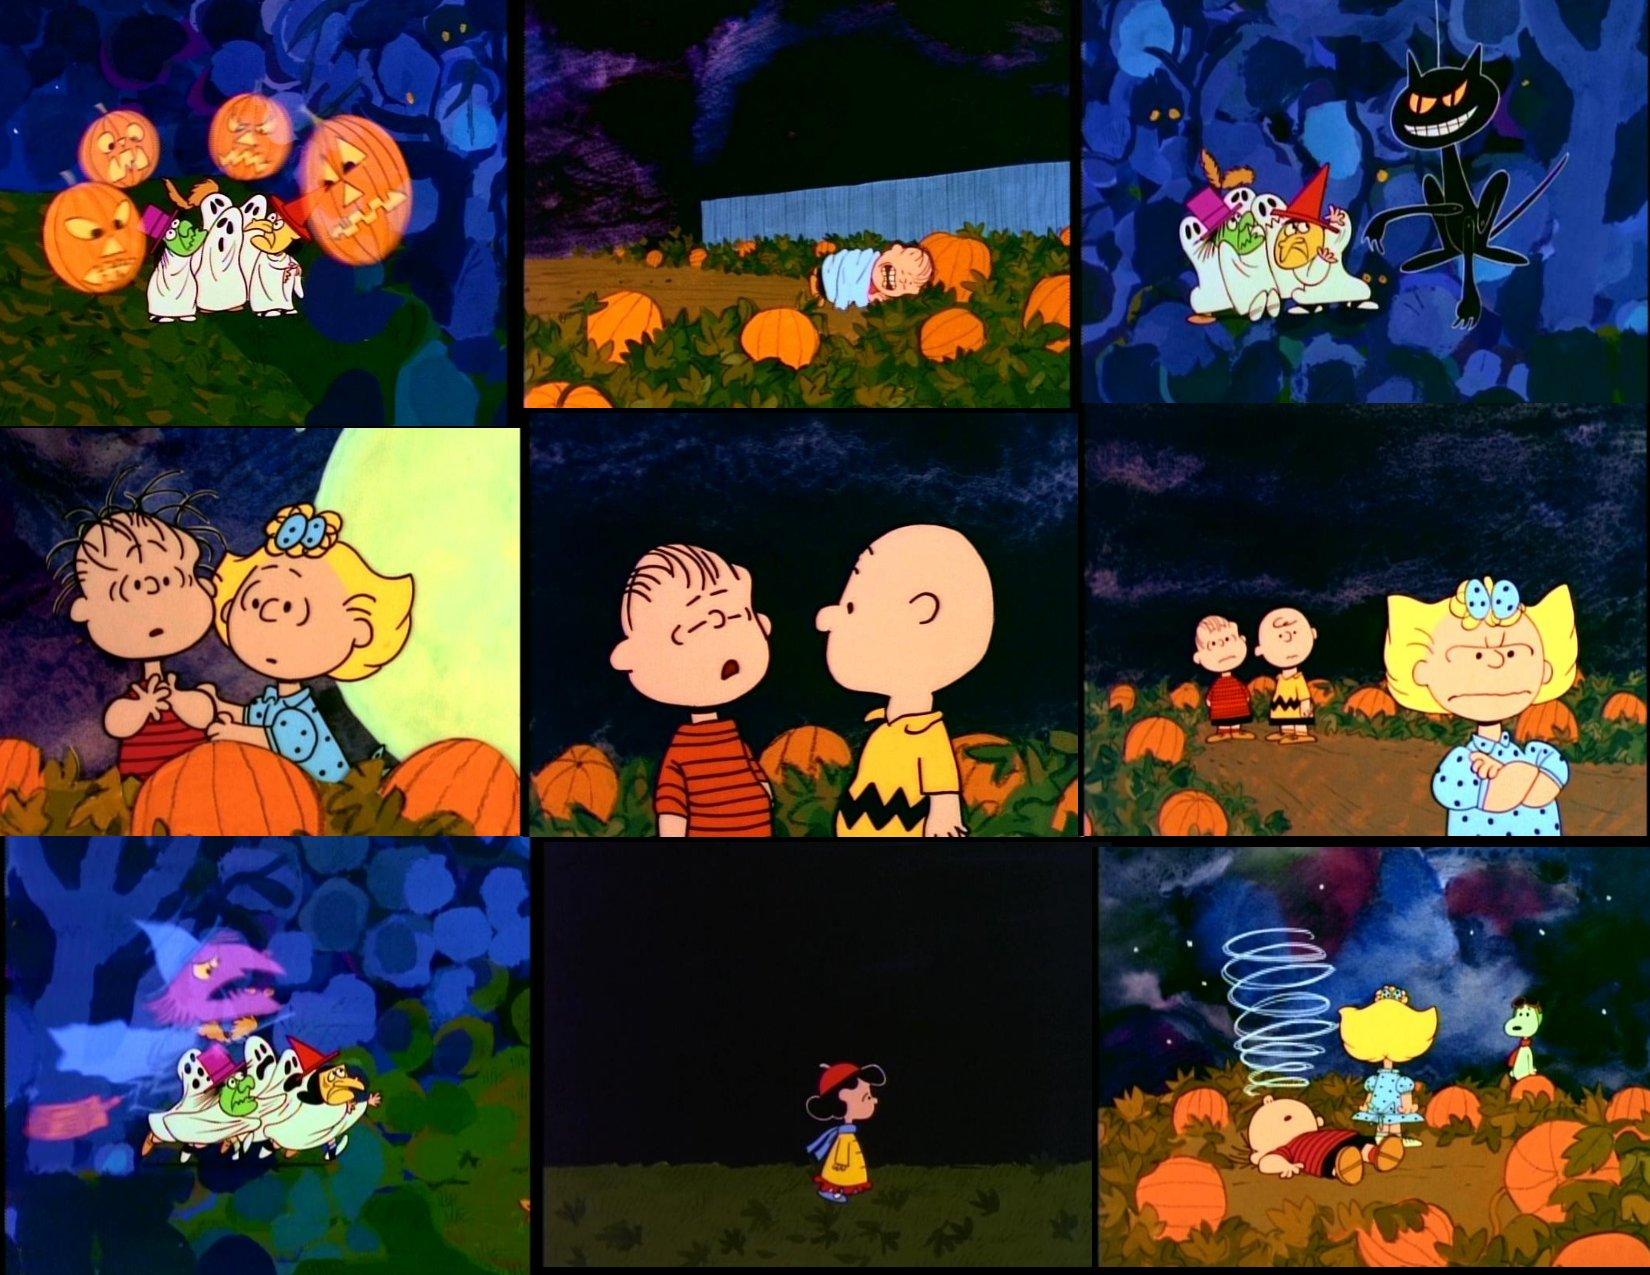 halloween wallpapers anime - HD Desktop Wallpapers | 4k HD